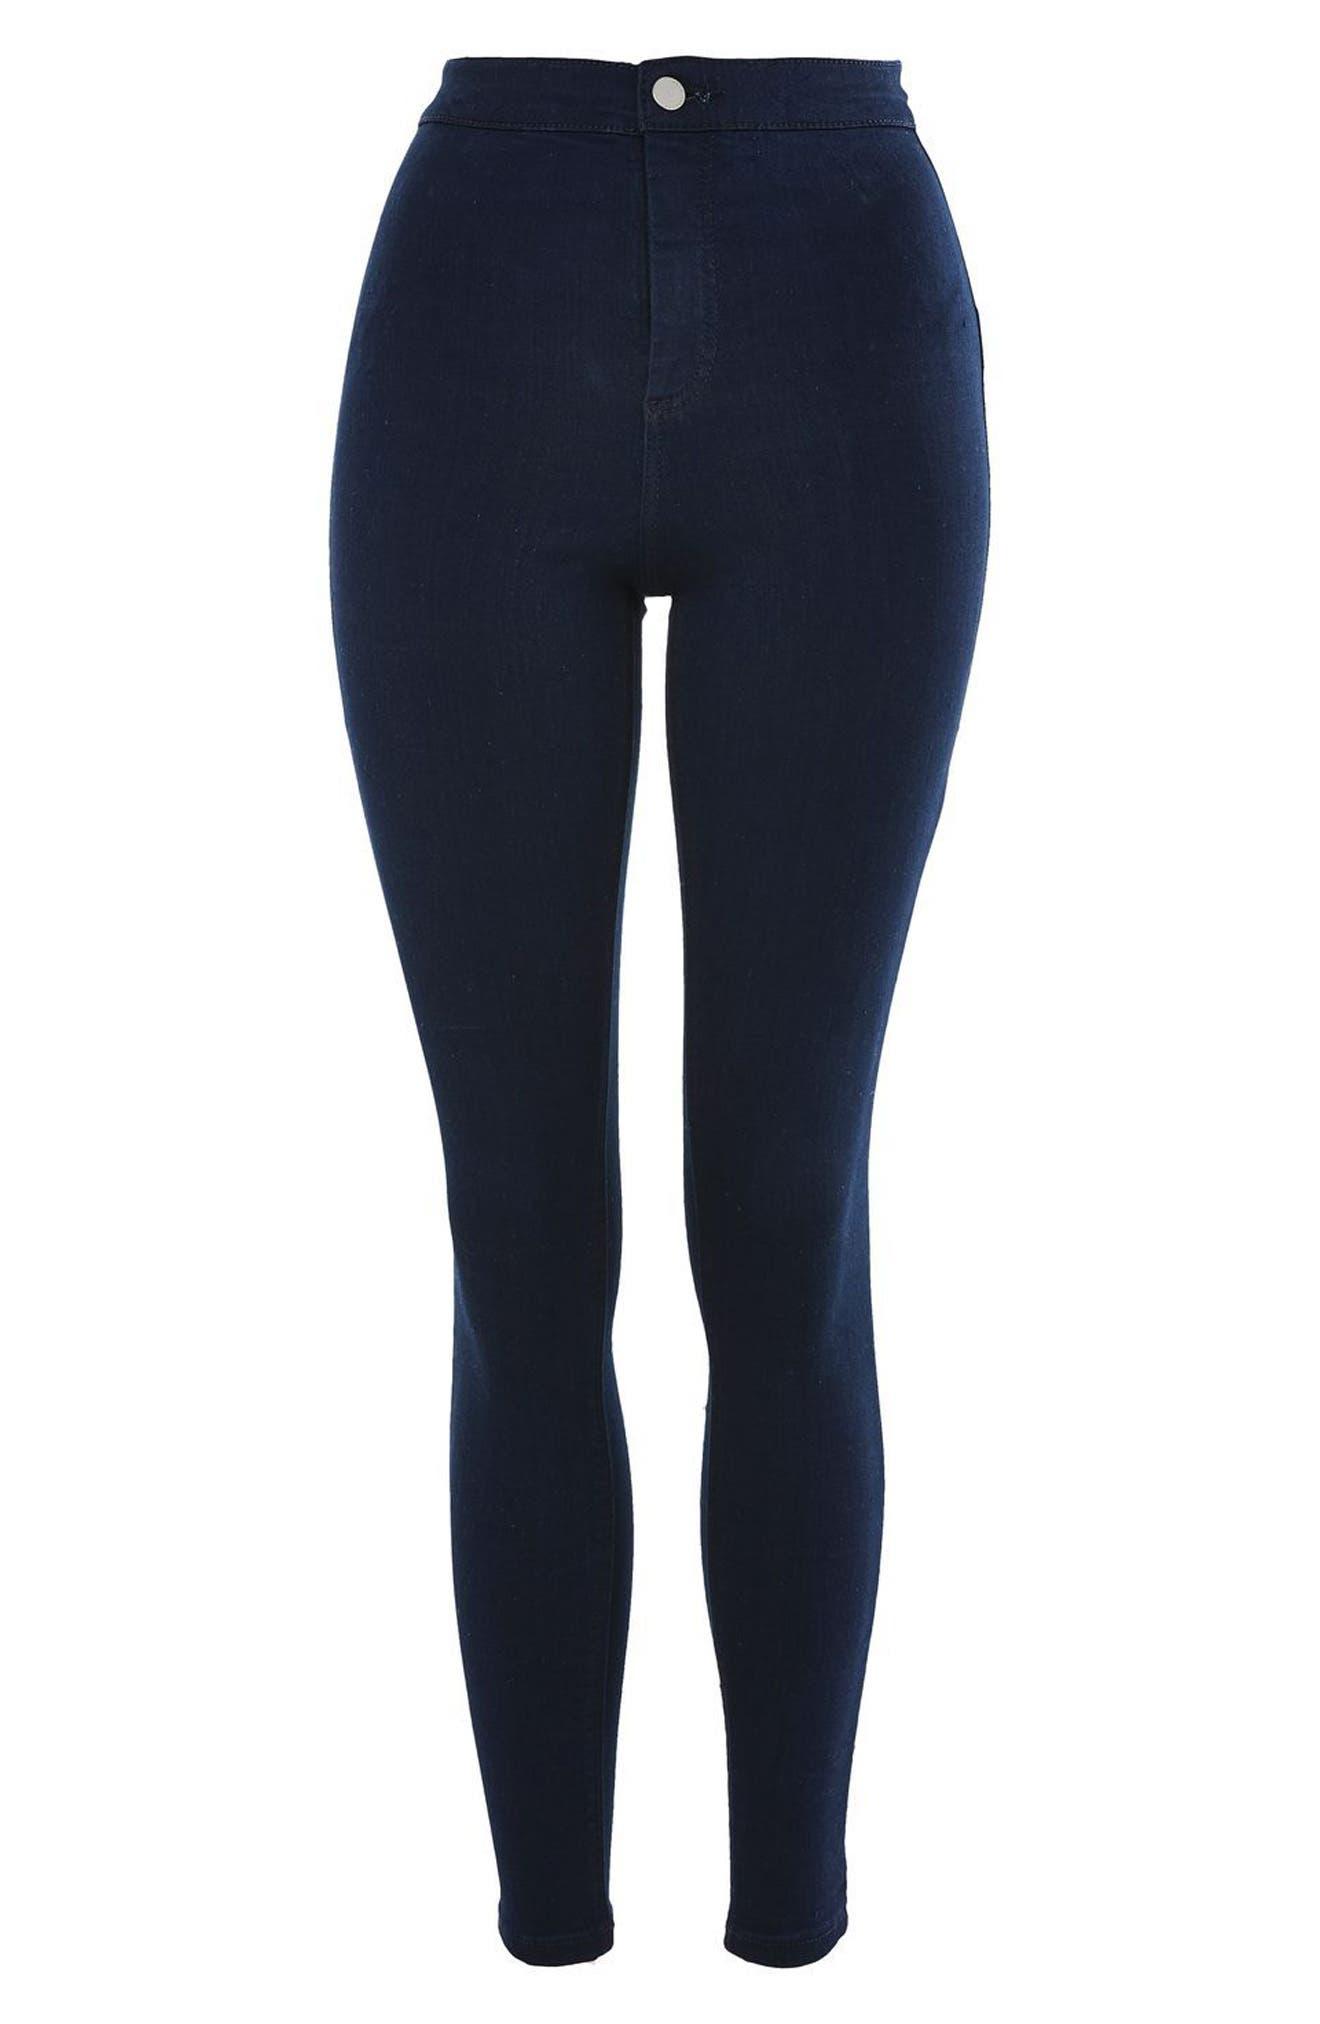 Joni High Waist Skinny Jeans,                             Alternate thumbnail 3, color,                             DARK INDIGO